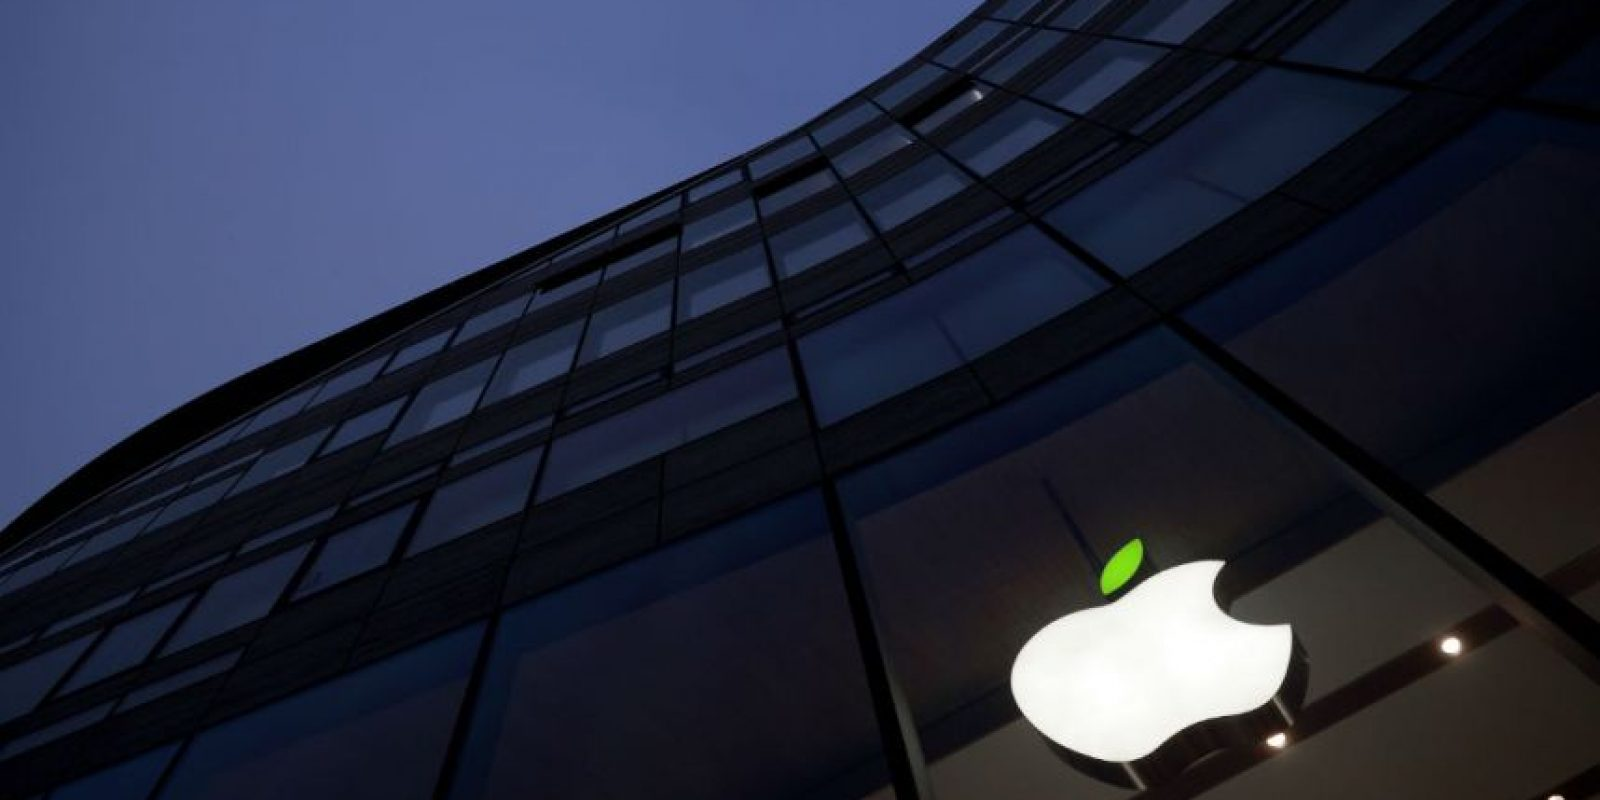 Luego de una batalla legal, un juez ordenó a Apple ayudar al FBI para desbloquear el iPhone del asesino de San Bernardino. Foto:Getty Images